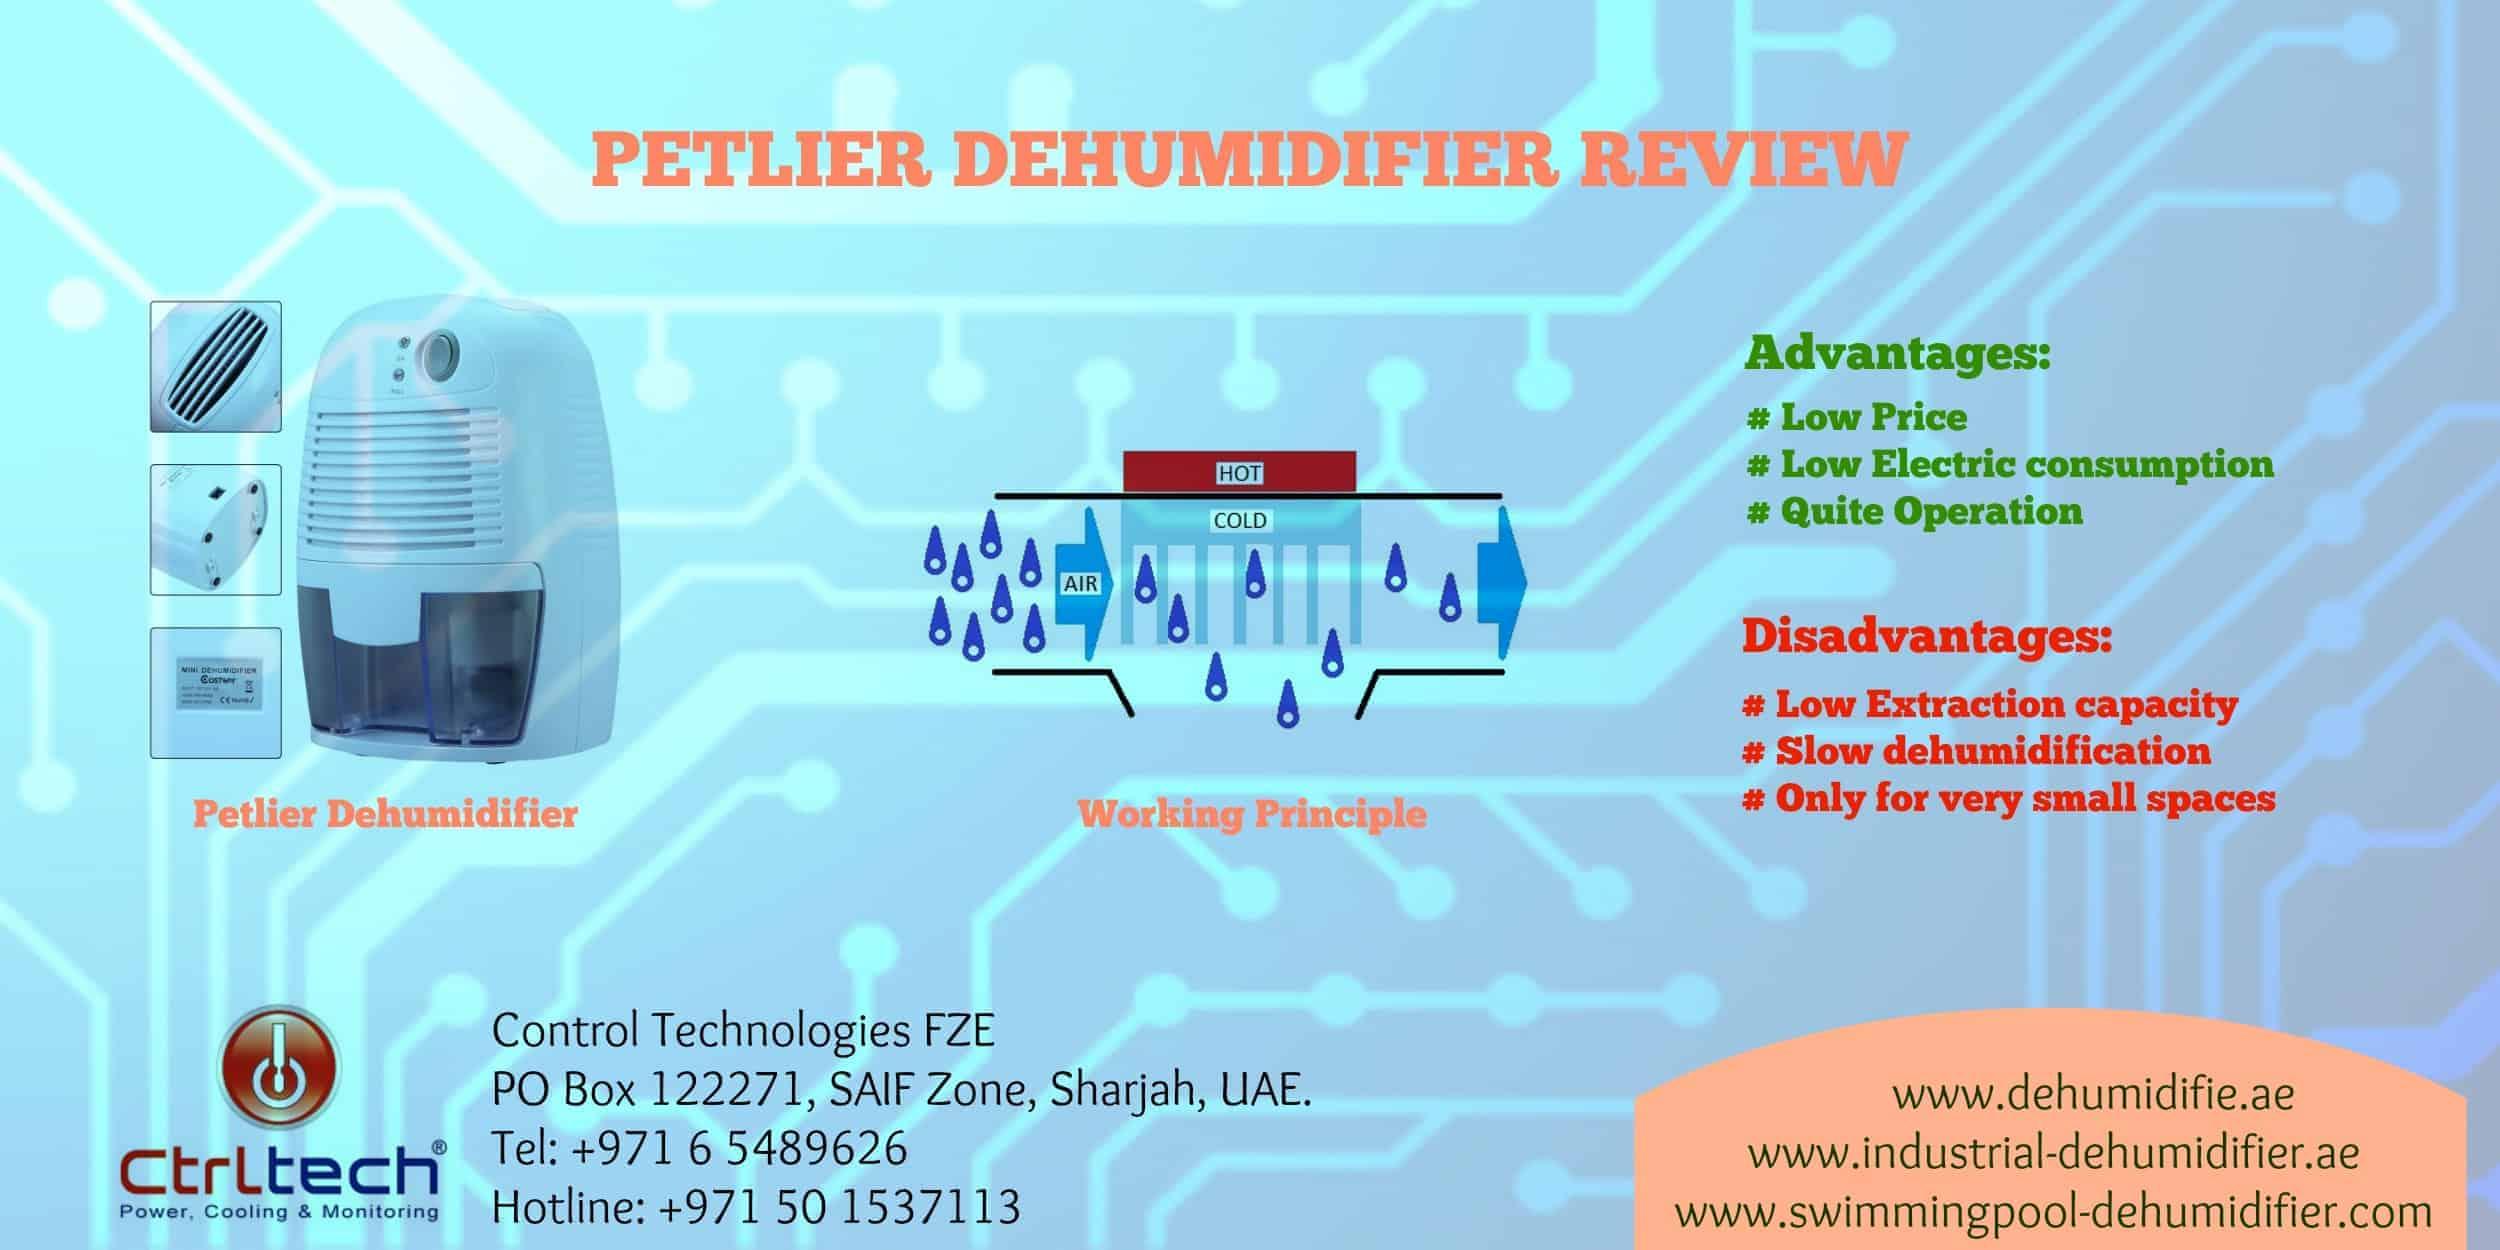 Petlier Dehumidifier reviews (Mini Dehumidifier)